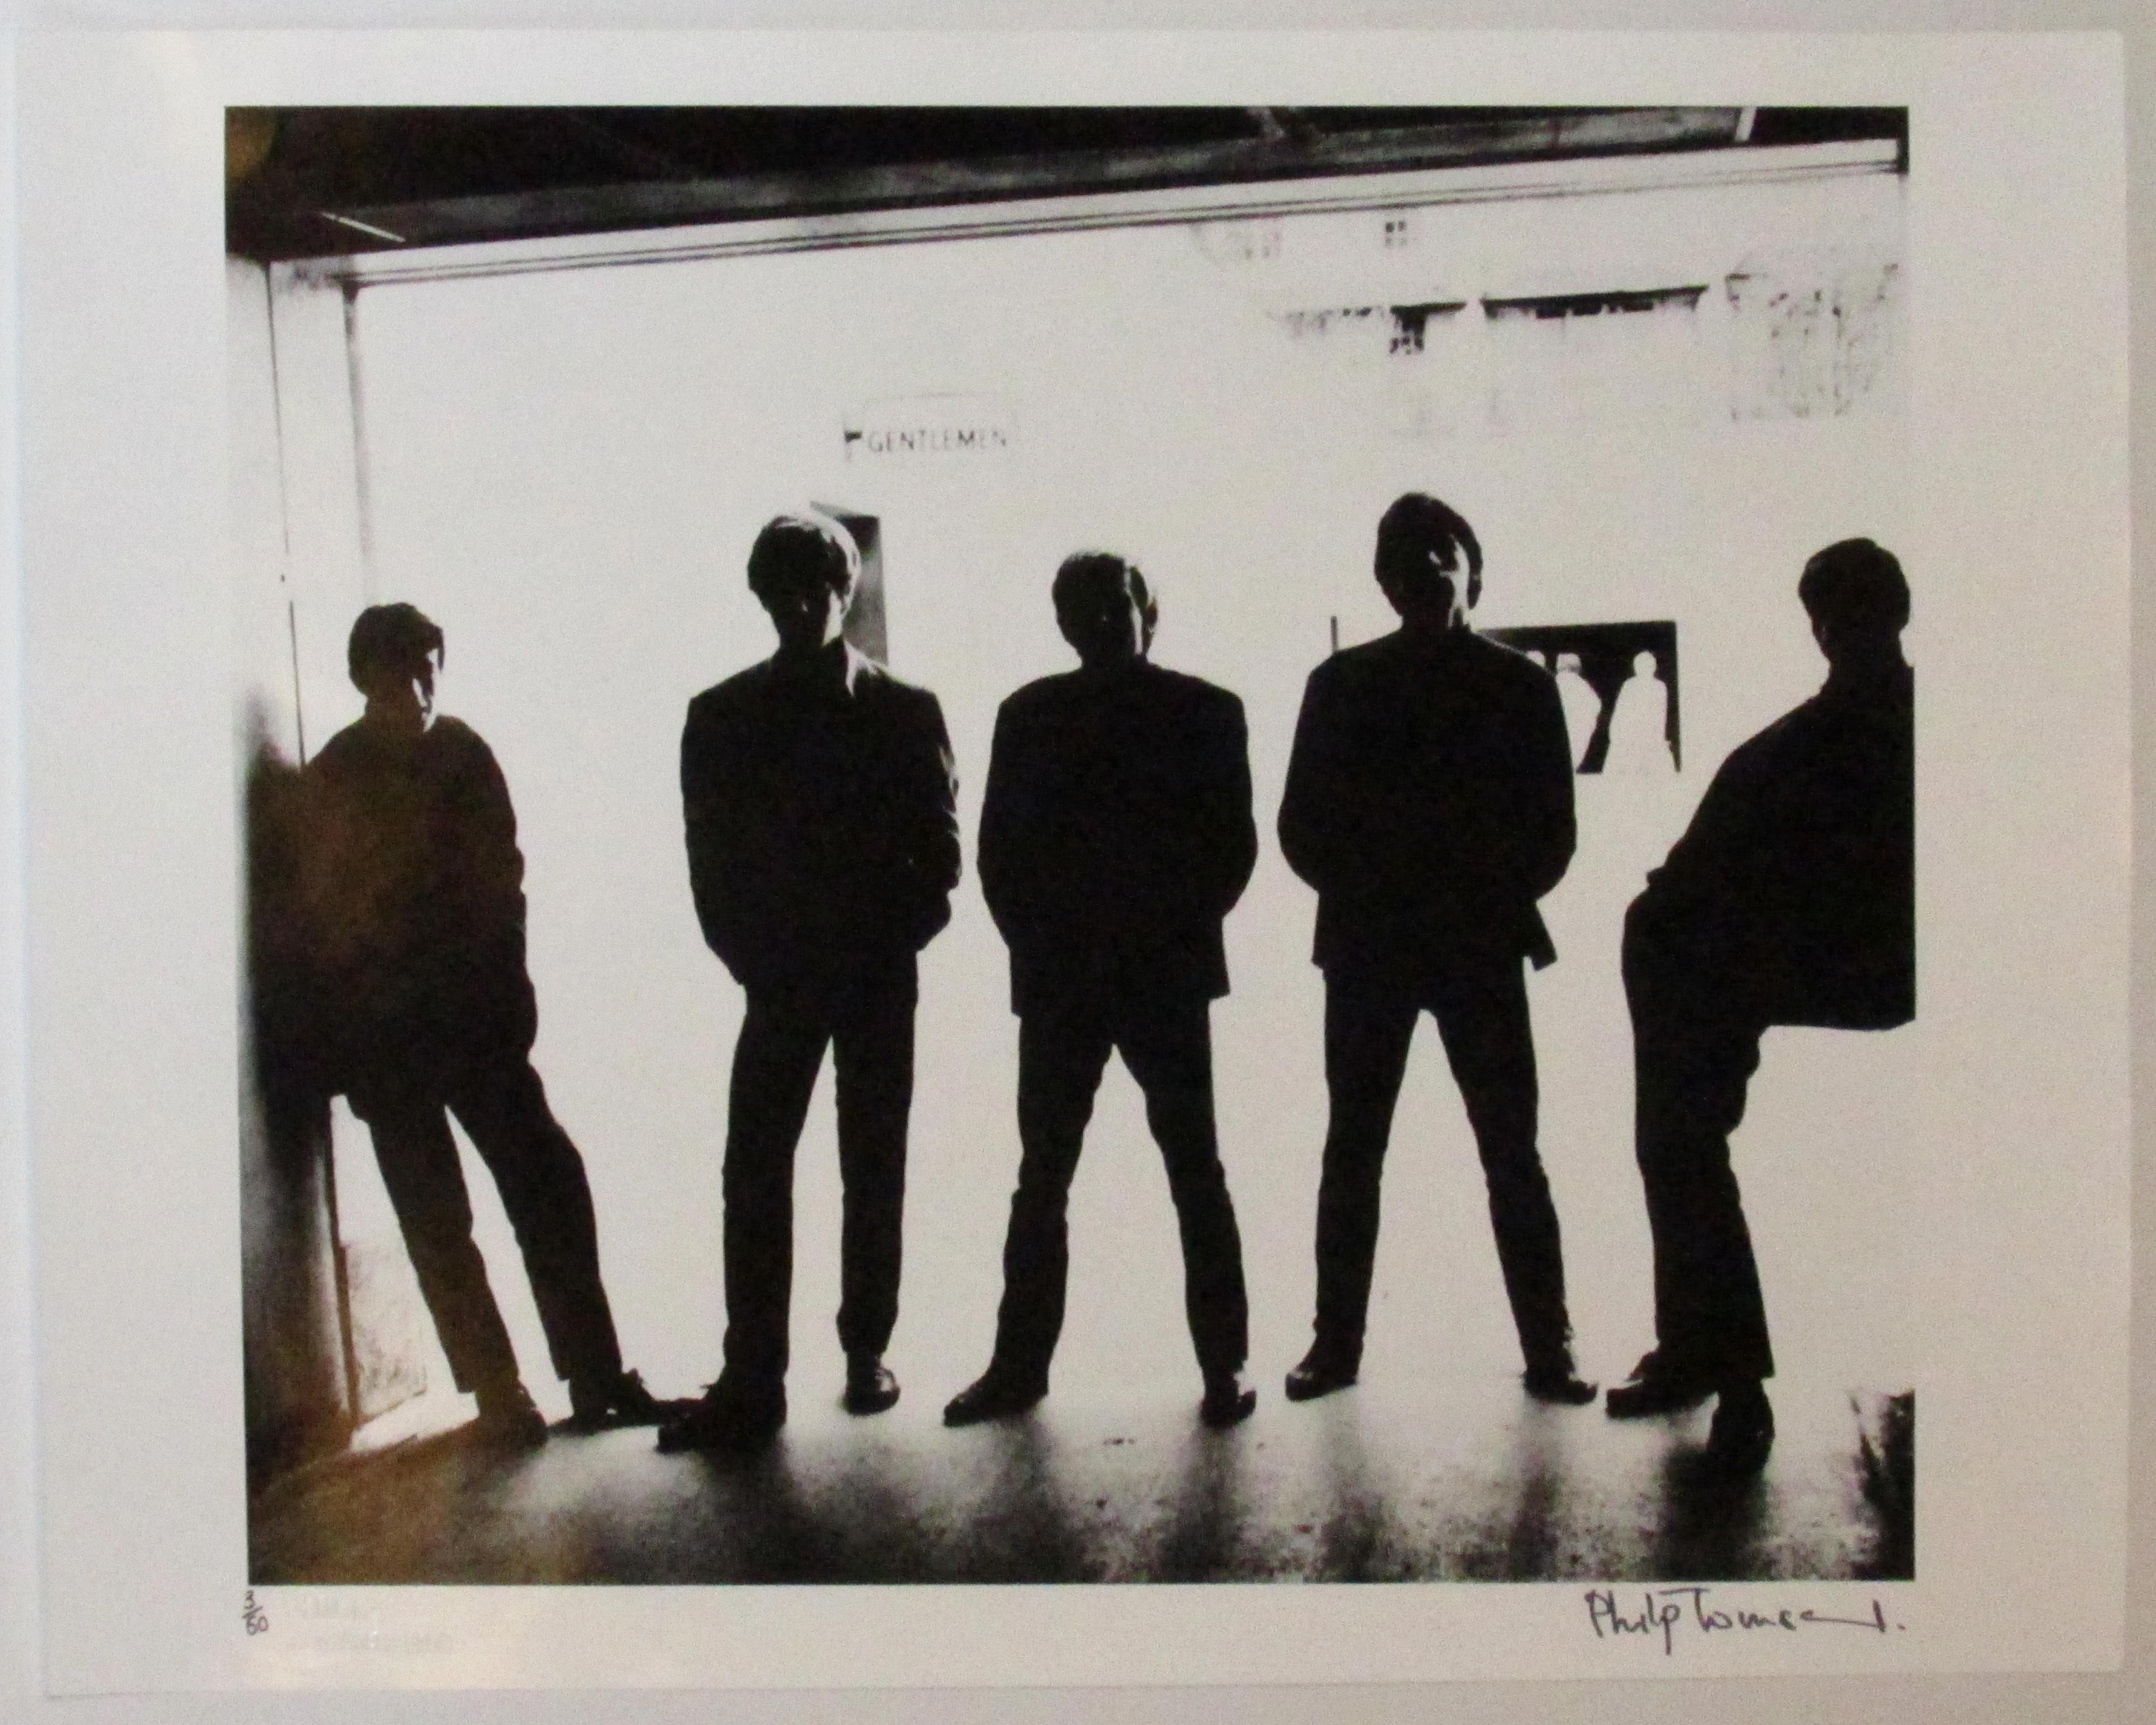 Rolling Stones - Public Convenience - IFF0005